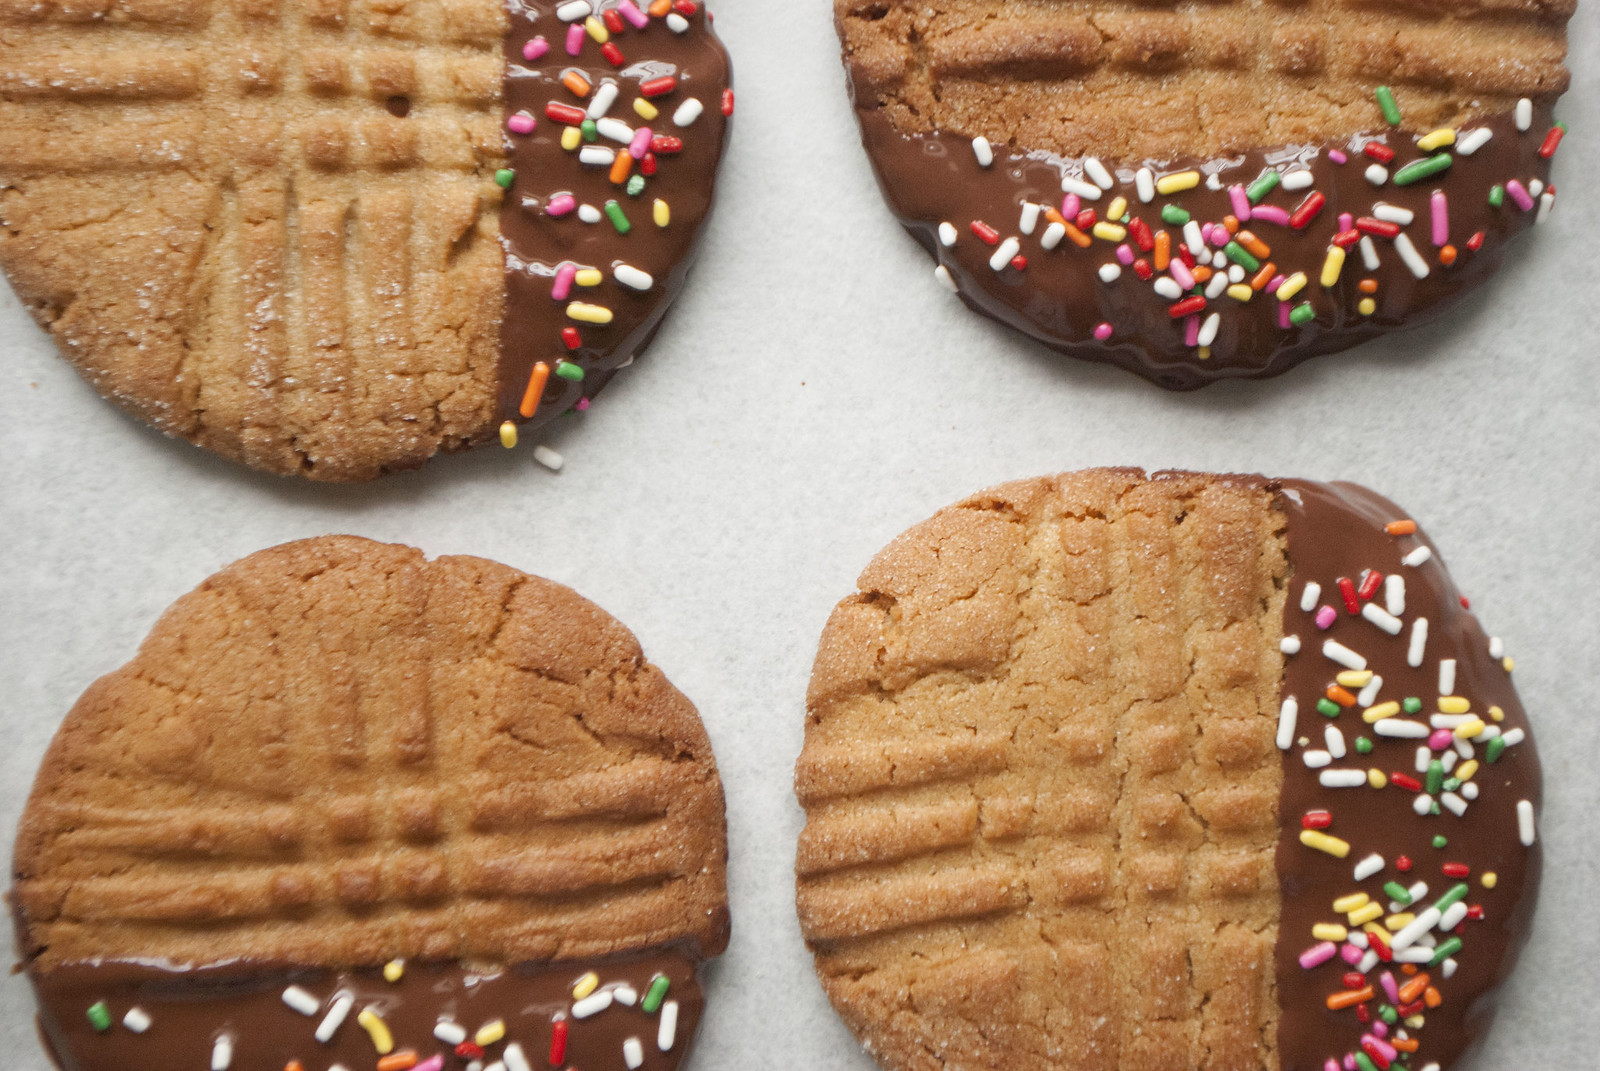 dipped + crisp peanut butter cookies